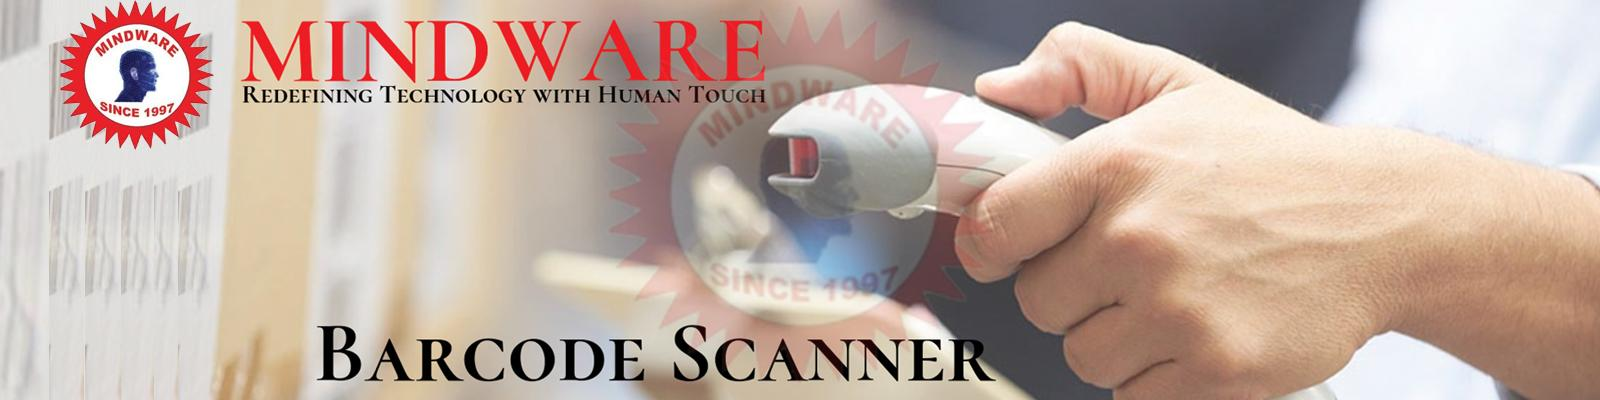 Mindware Scanner